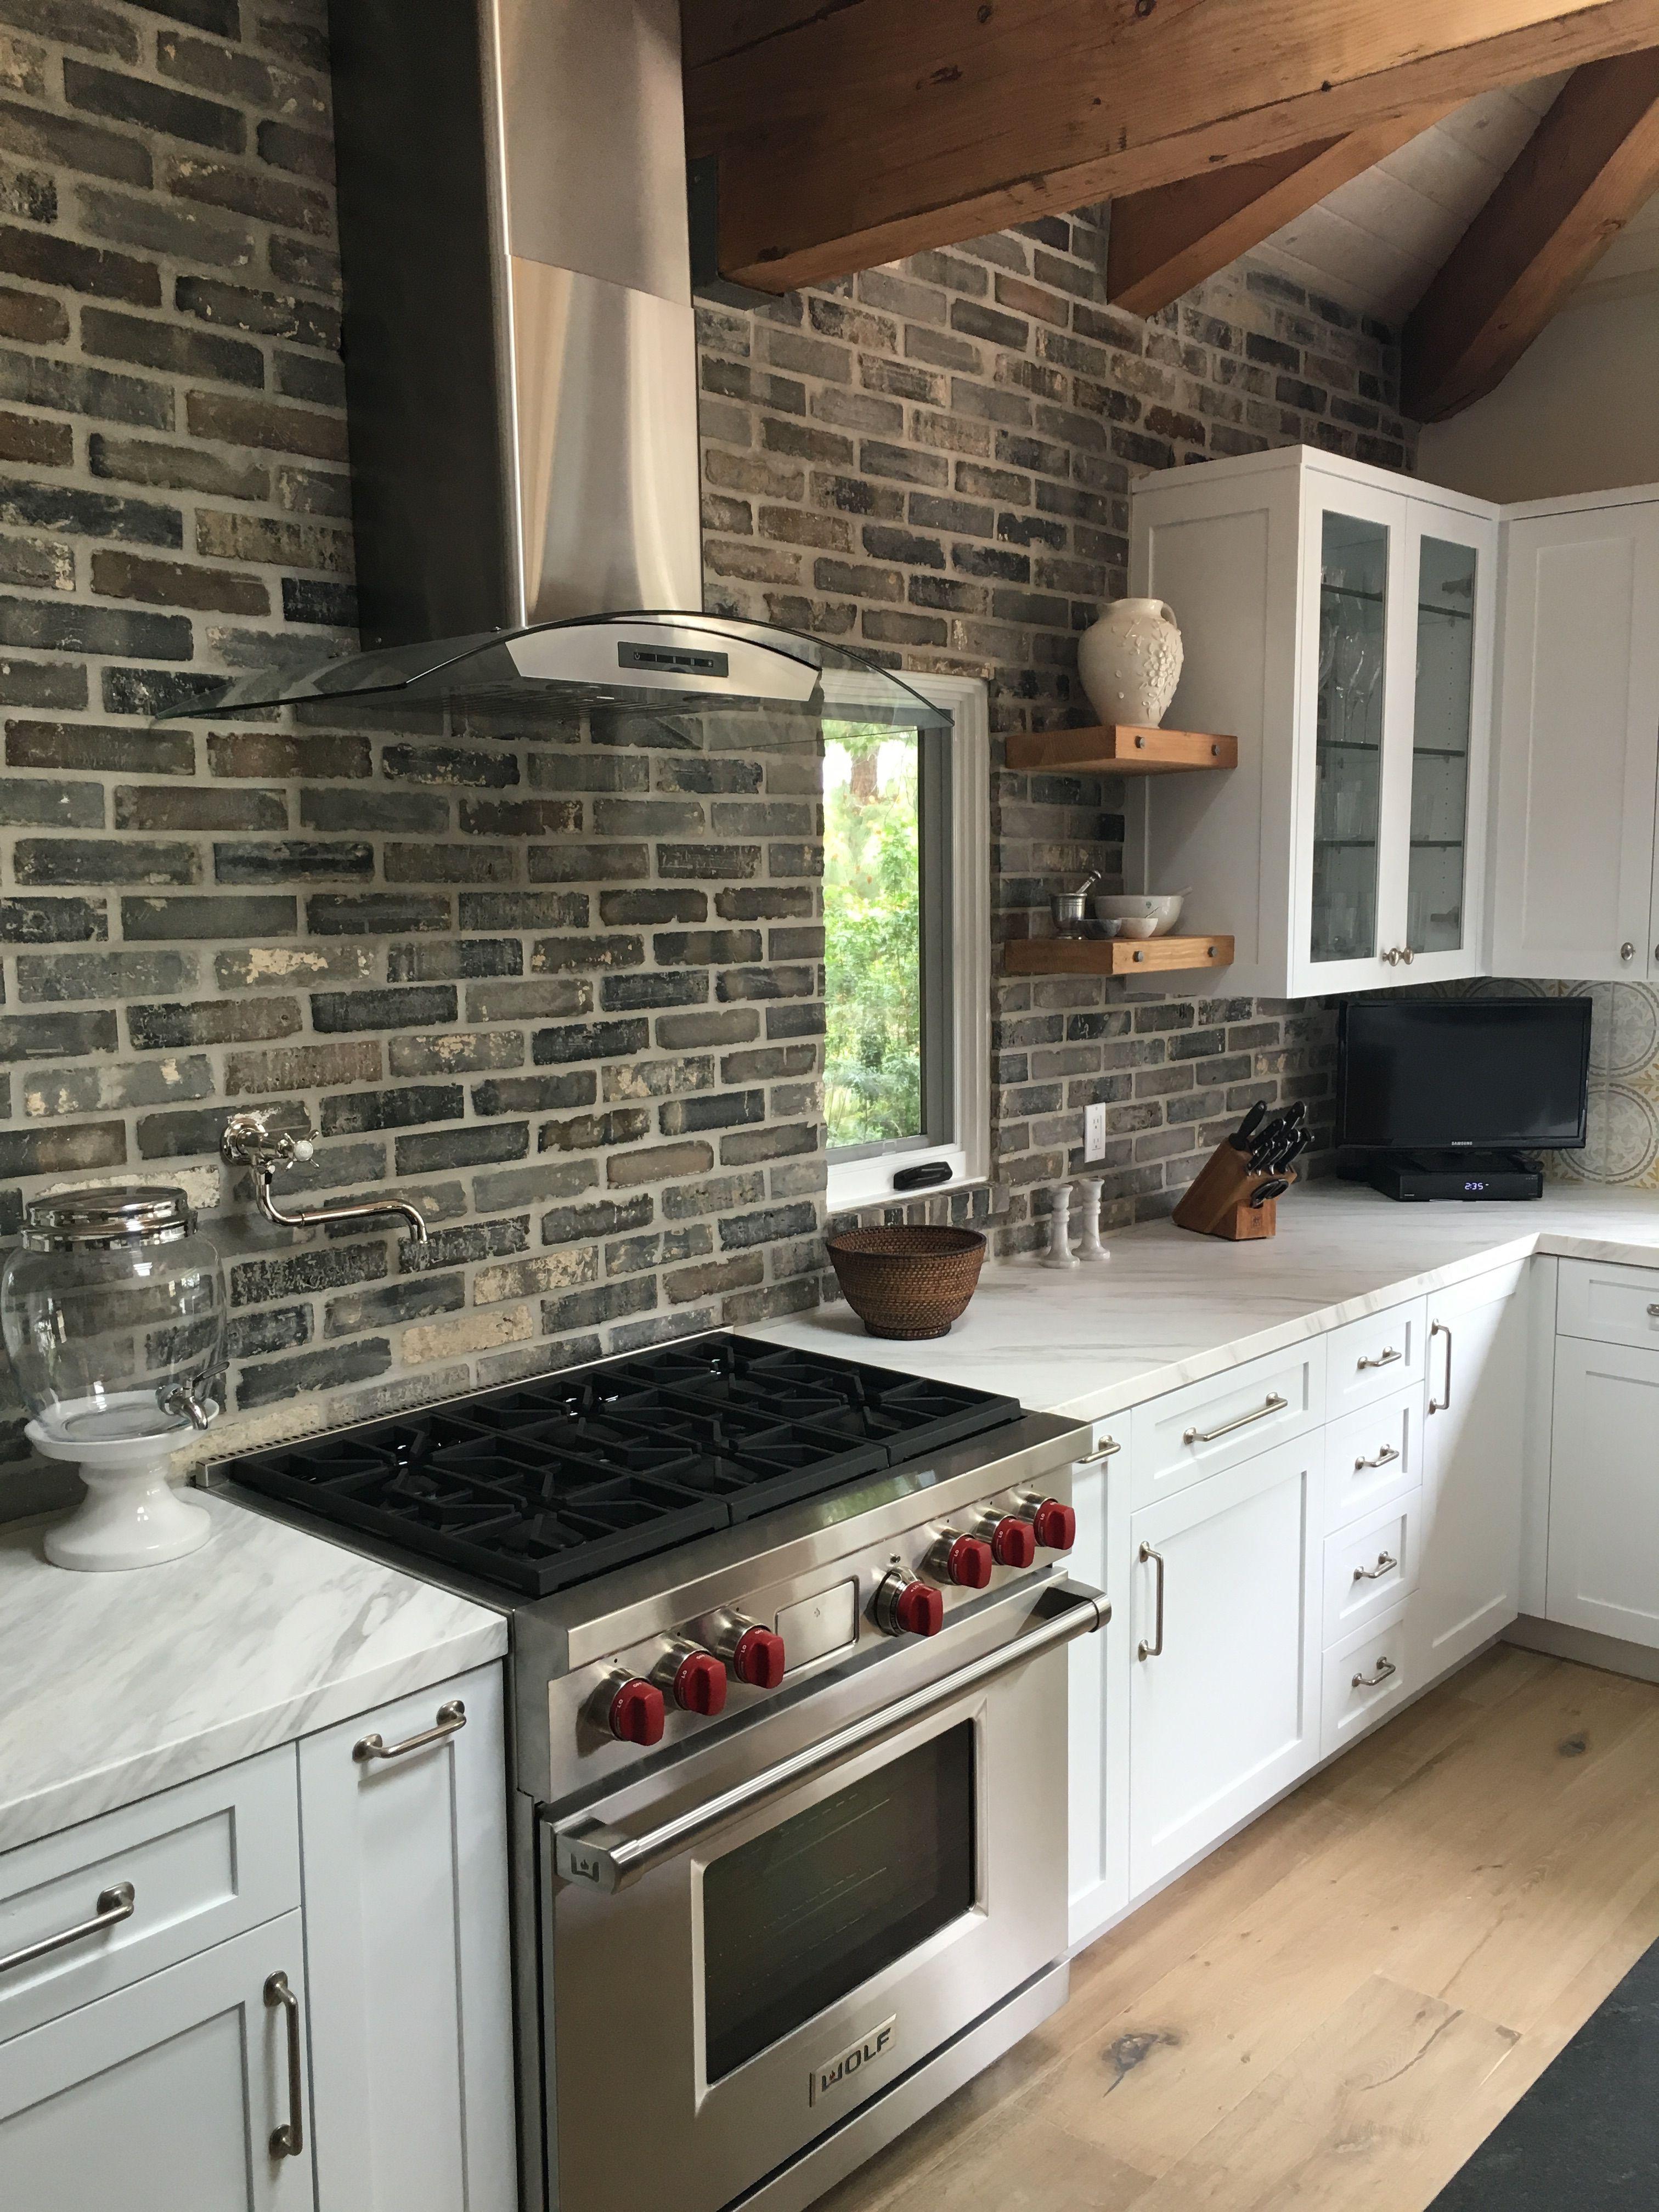 Reclaimed Brick Kitchen Backsplash In 2020 Brick Kitchen Gray Kitchen Backsplash Brick Backsplash Kitchen